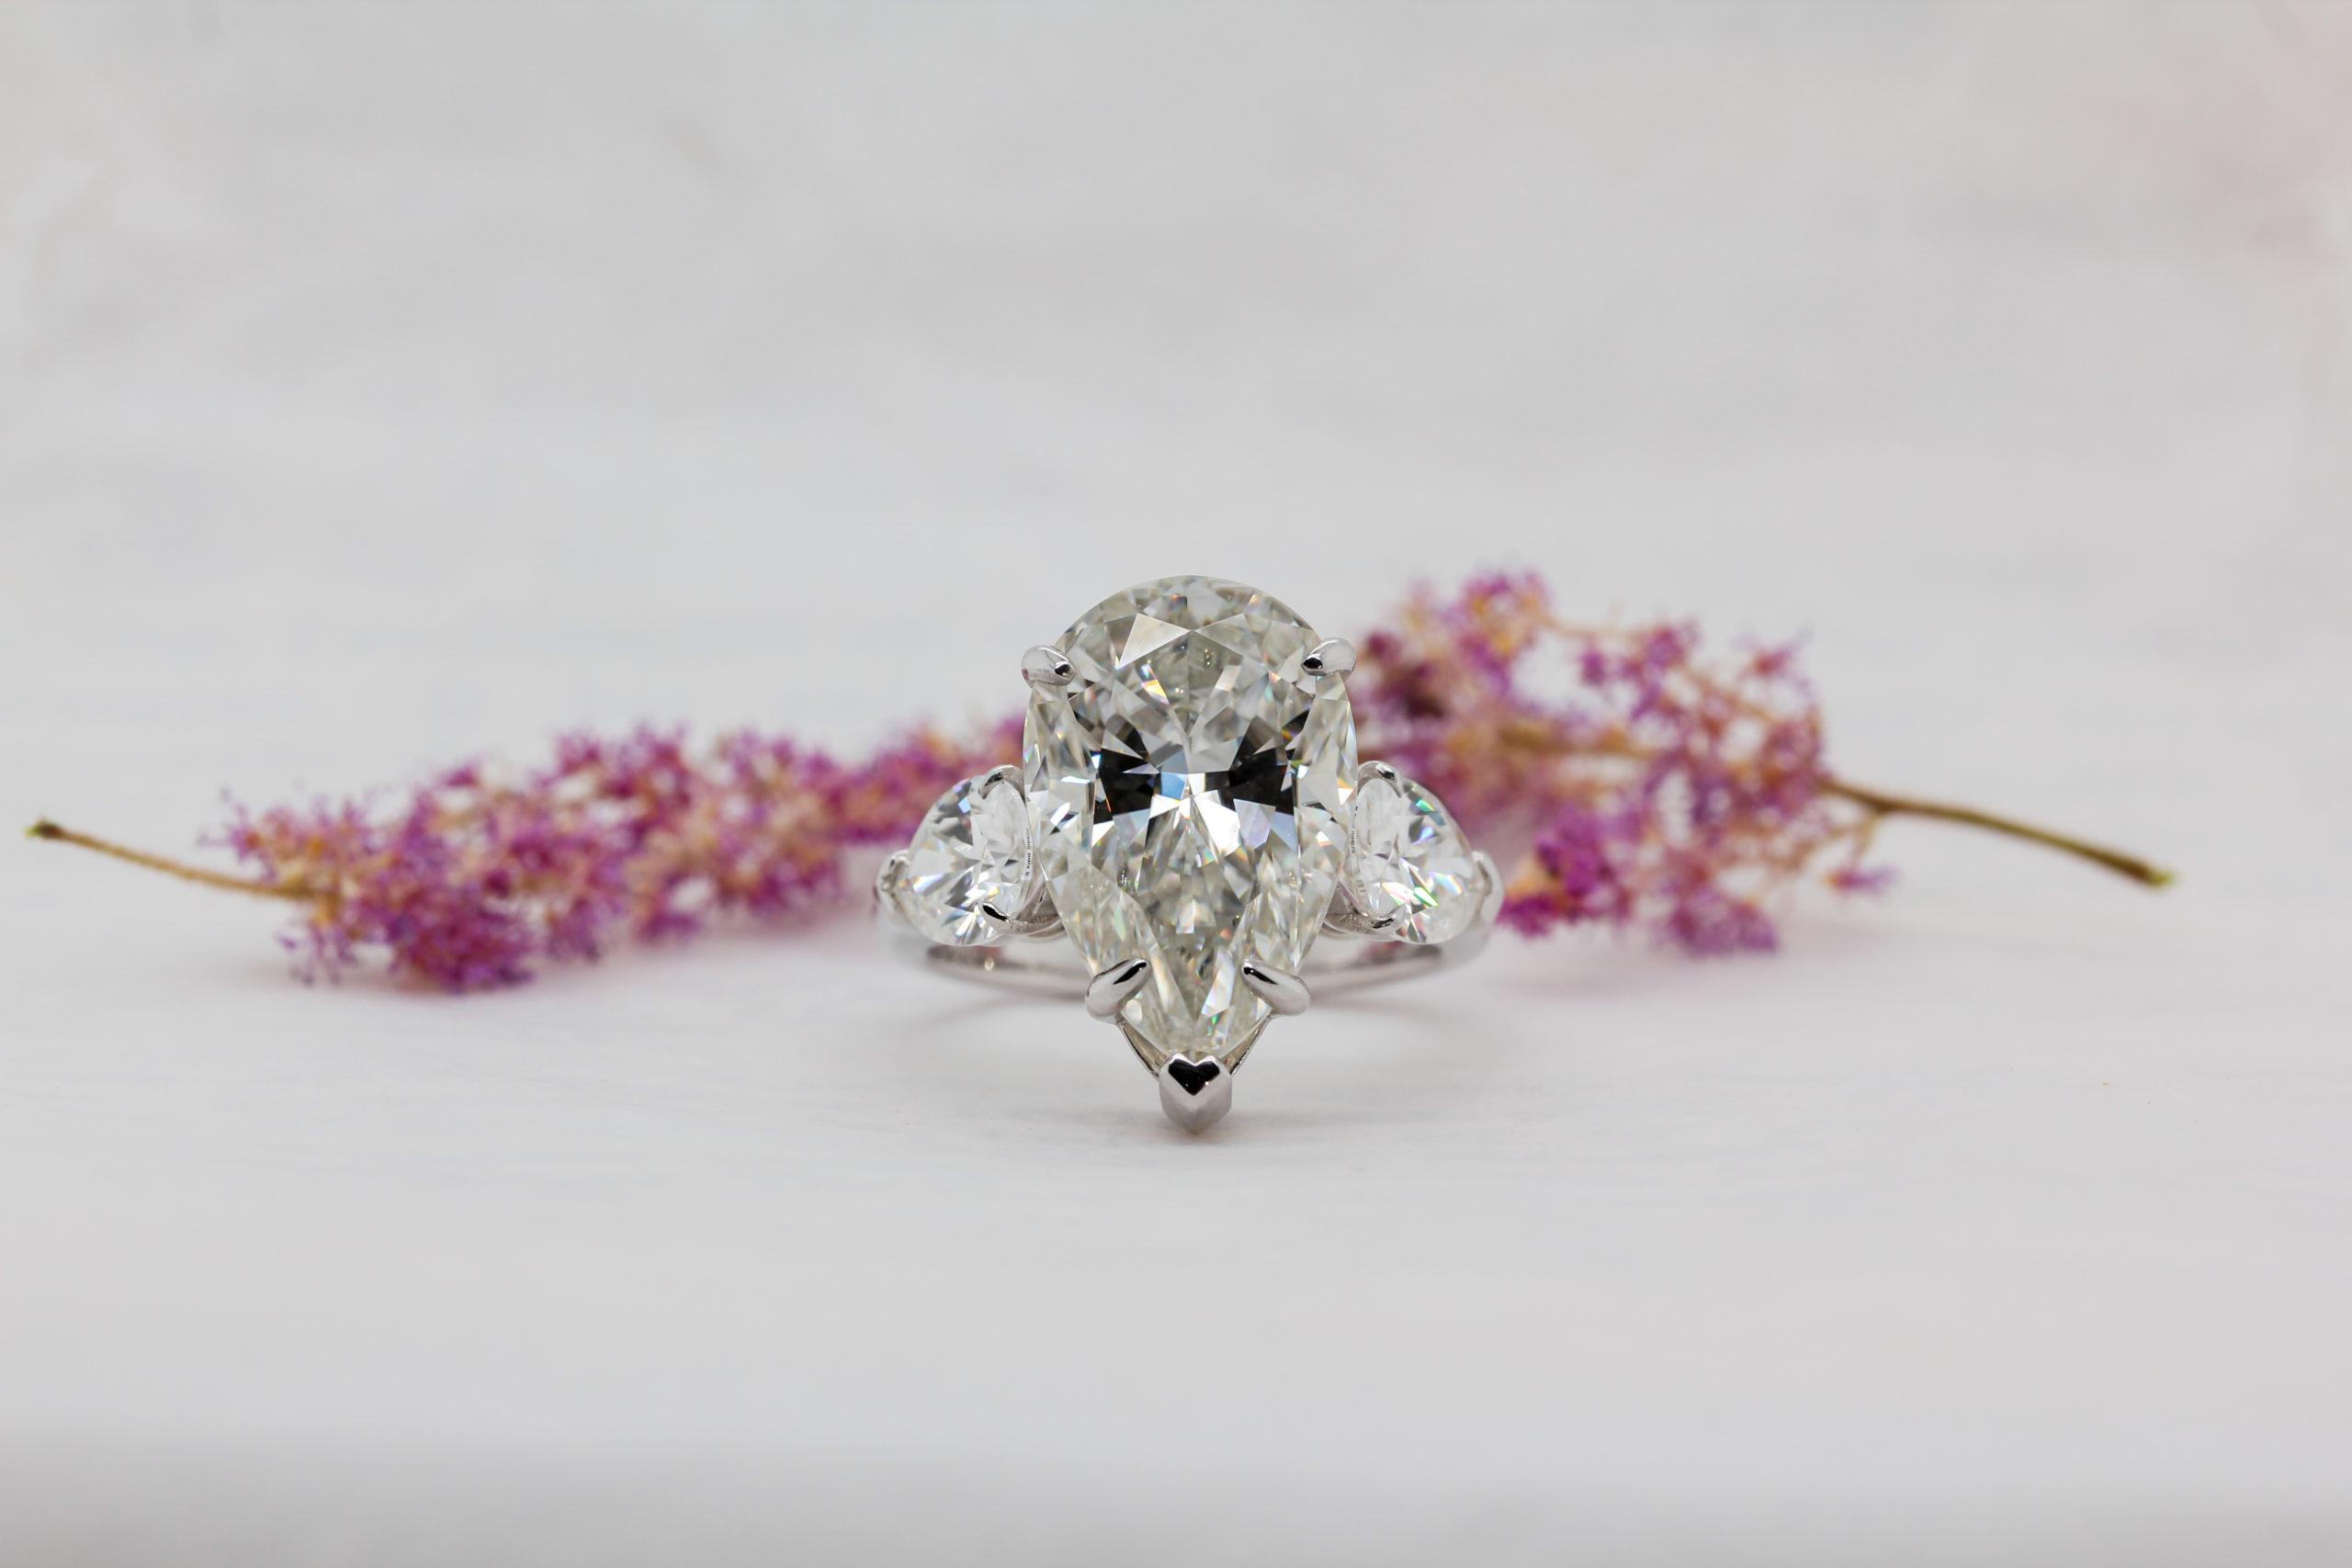 Celebrity Engagement Rings 2020 |Ethica Diamonds UK